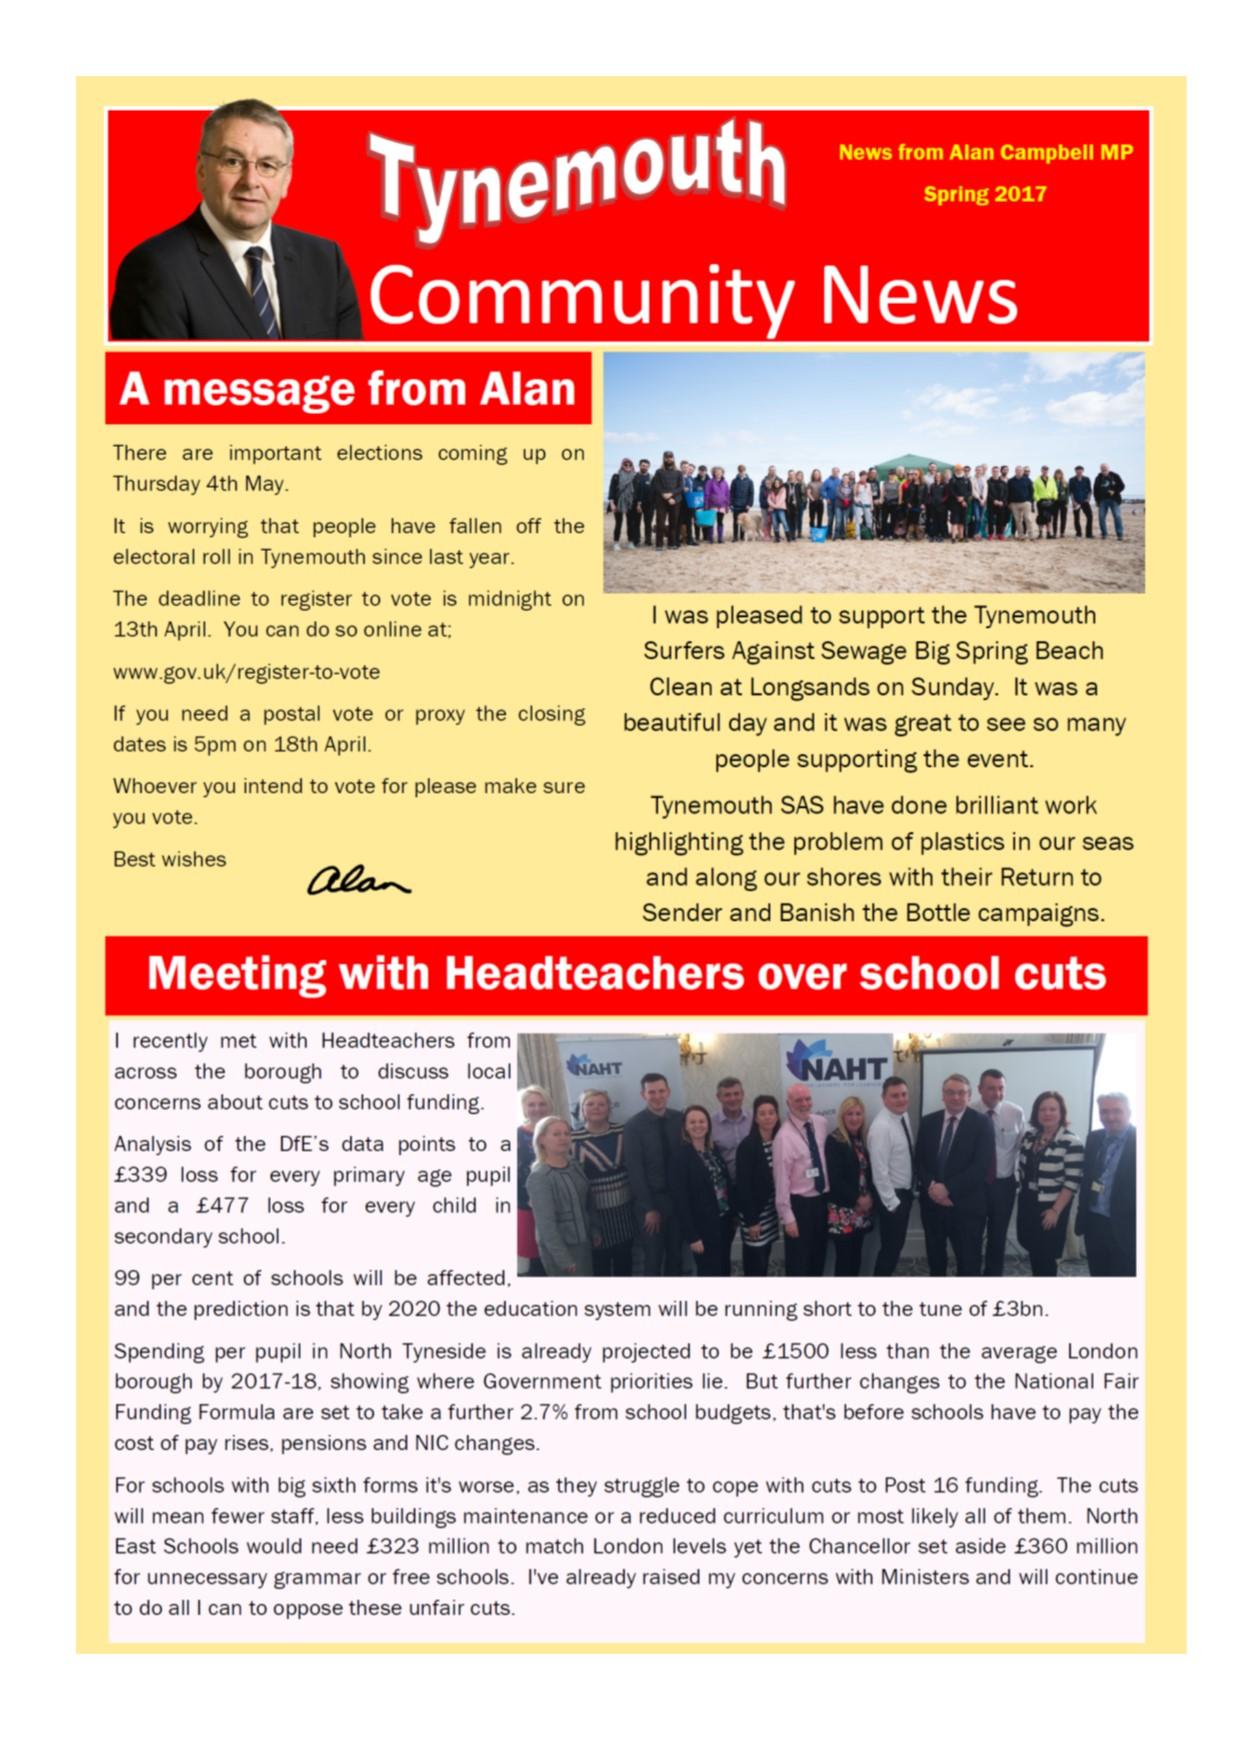 Alan_Campbell_MP_-_Community_News_April_2017_.jpg